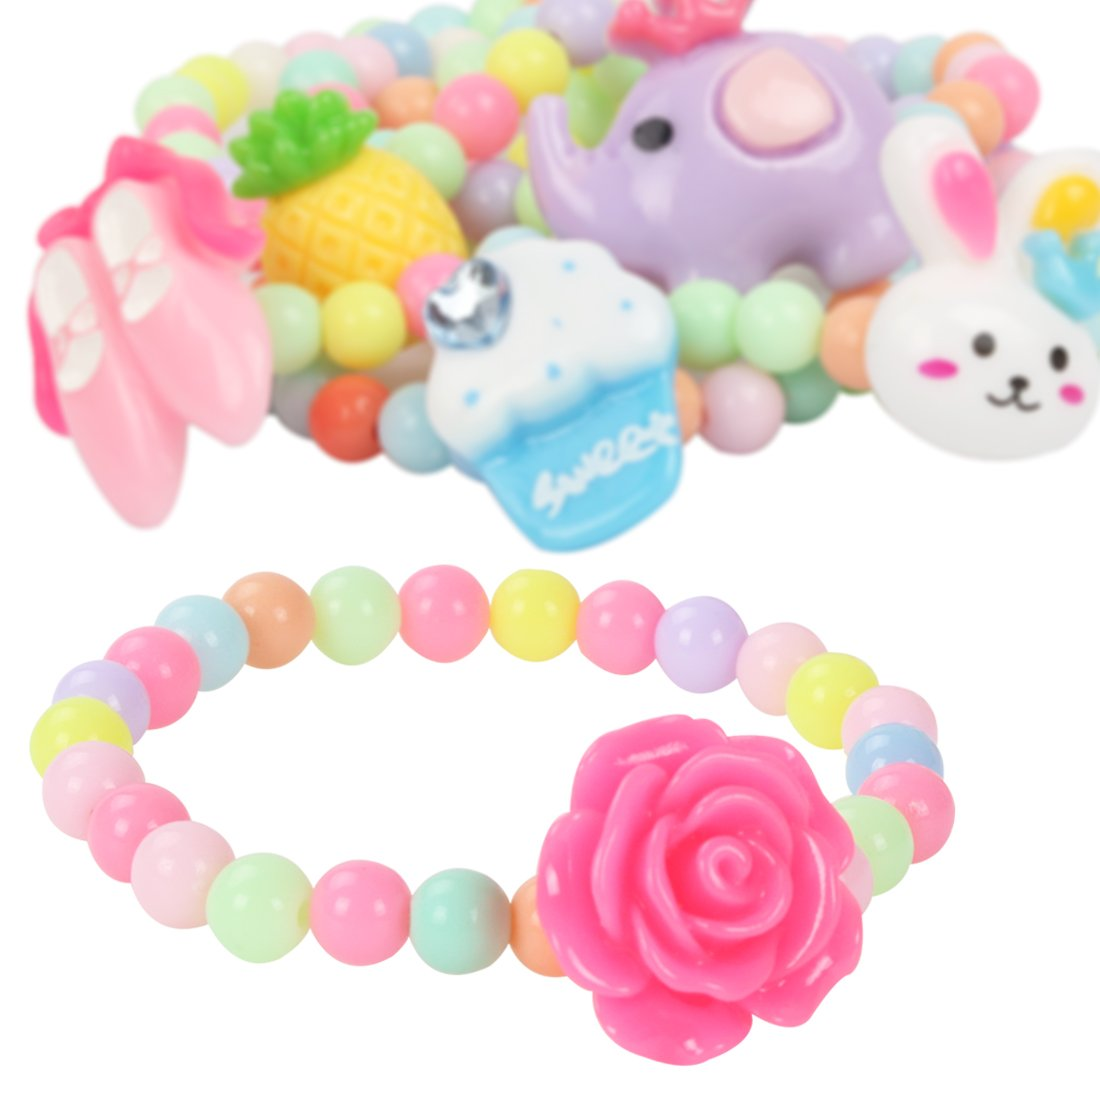 kilofly 6 Sets Princess Party Favors Girls Jewelry Rings Elastic Bracelets Pack by kilofly (Image #2)